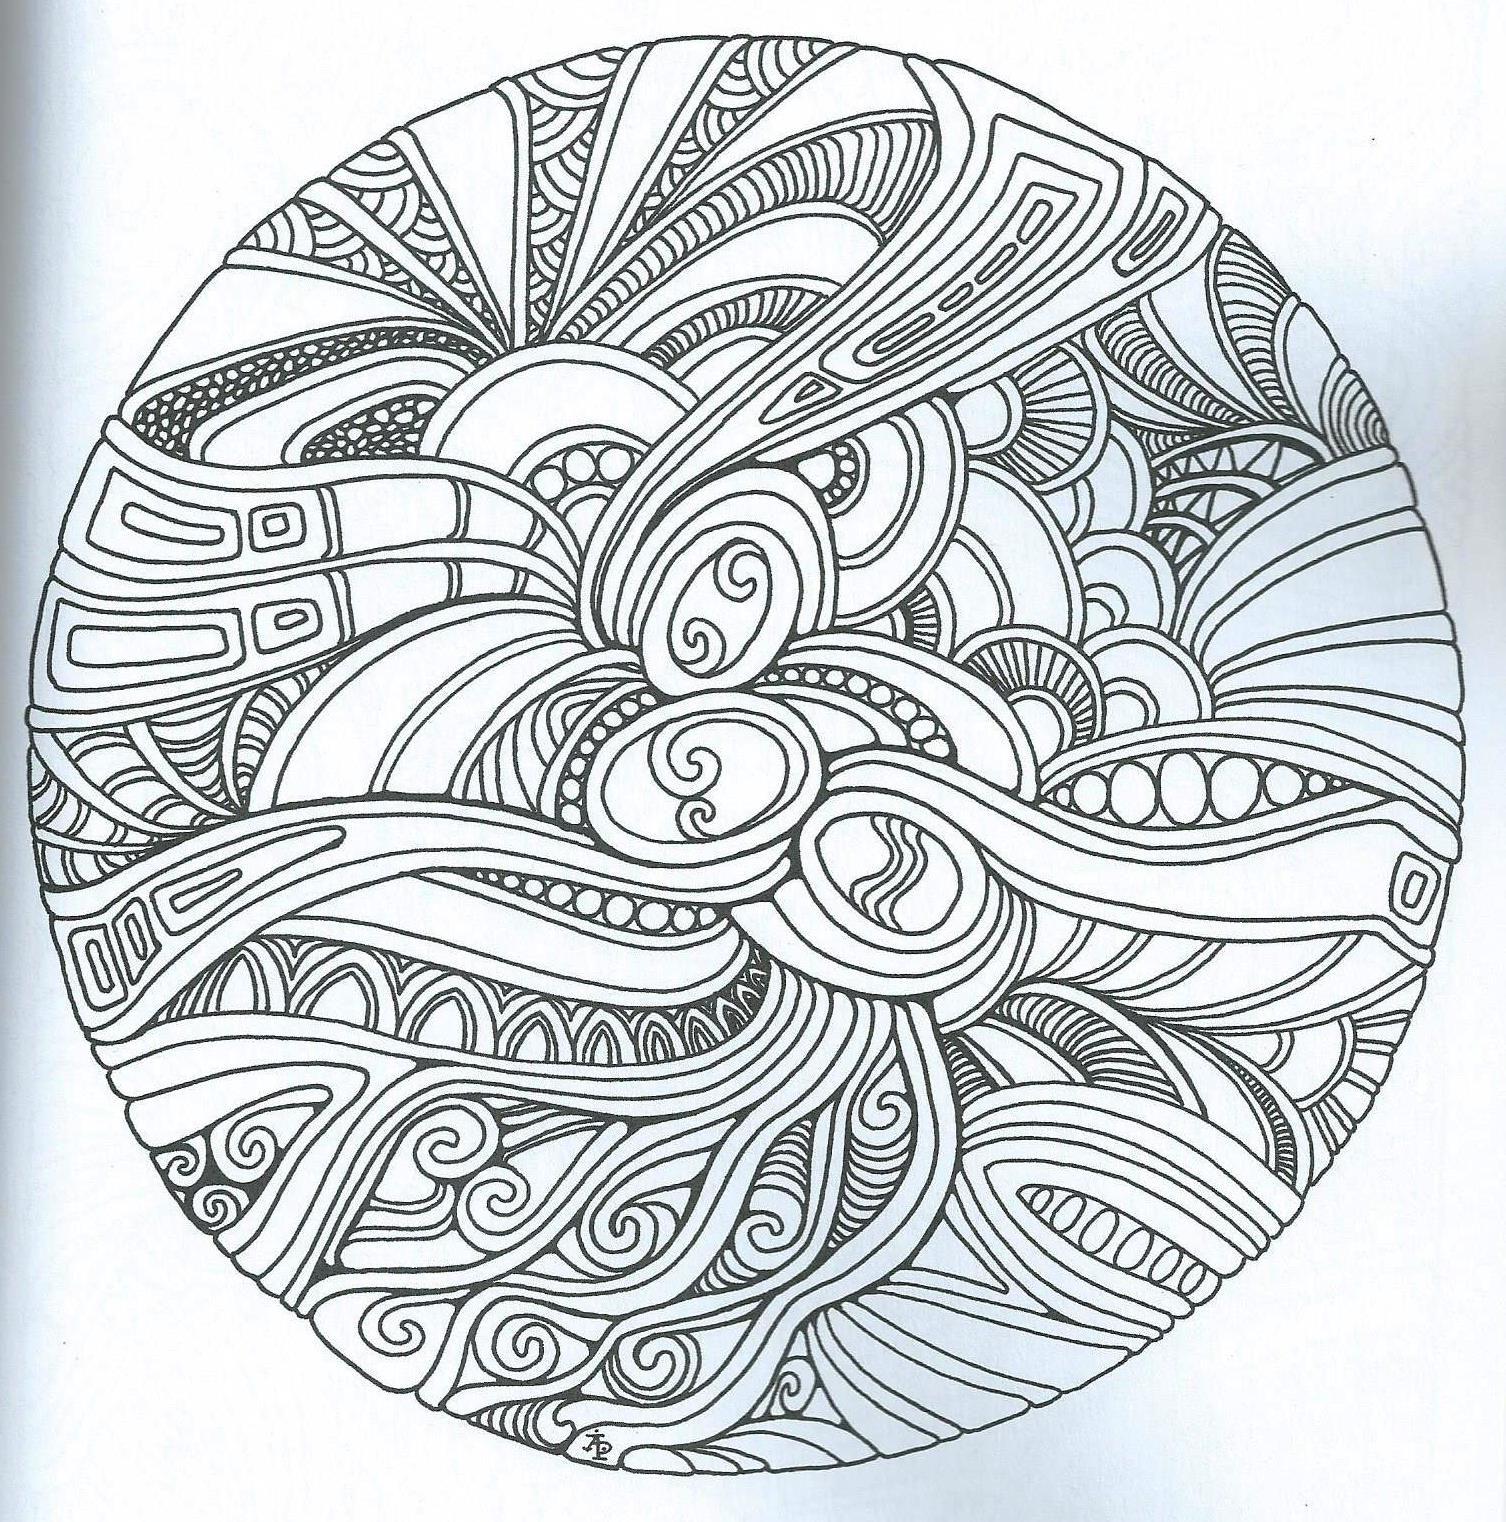 Zentangle | Mandalas | Pinterest | Adult coloring, Mandala and Doodles